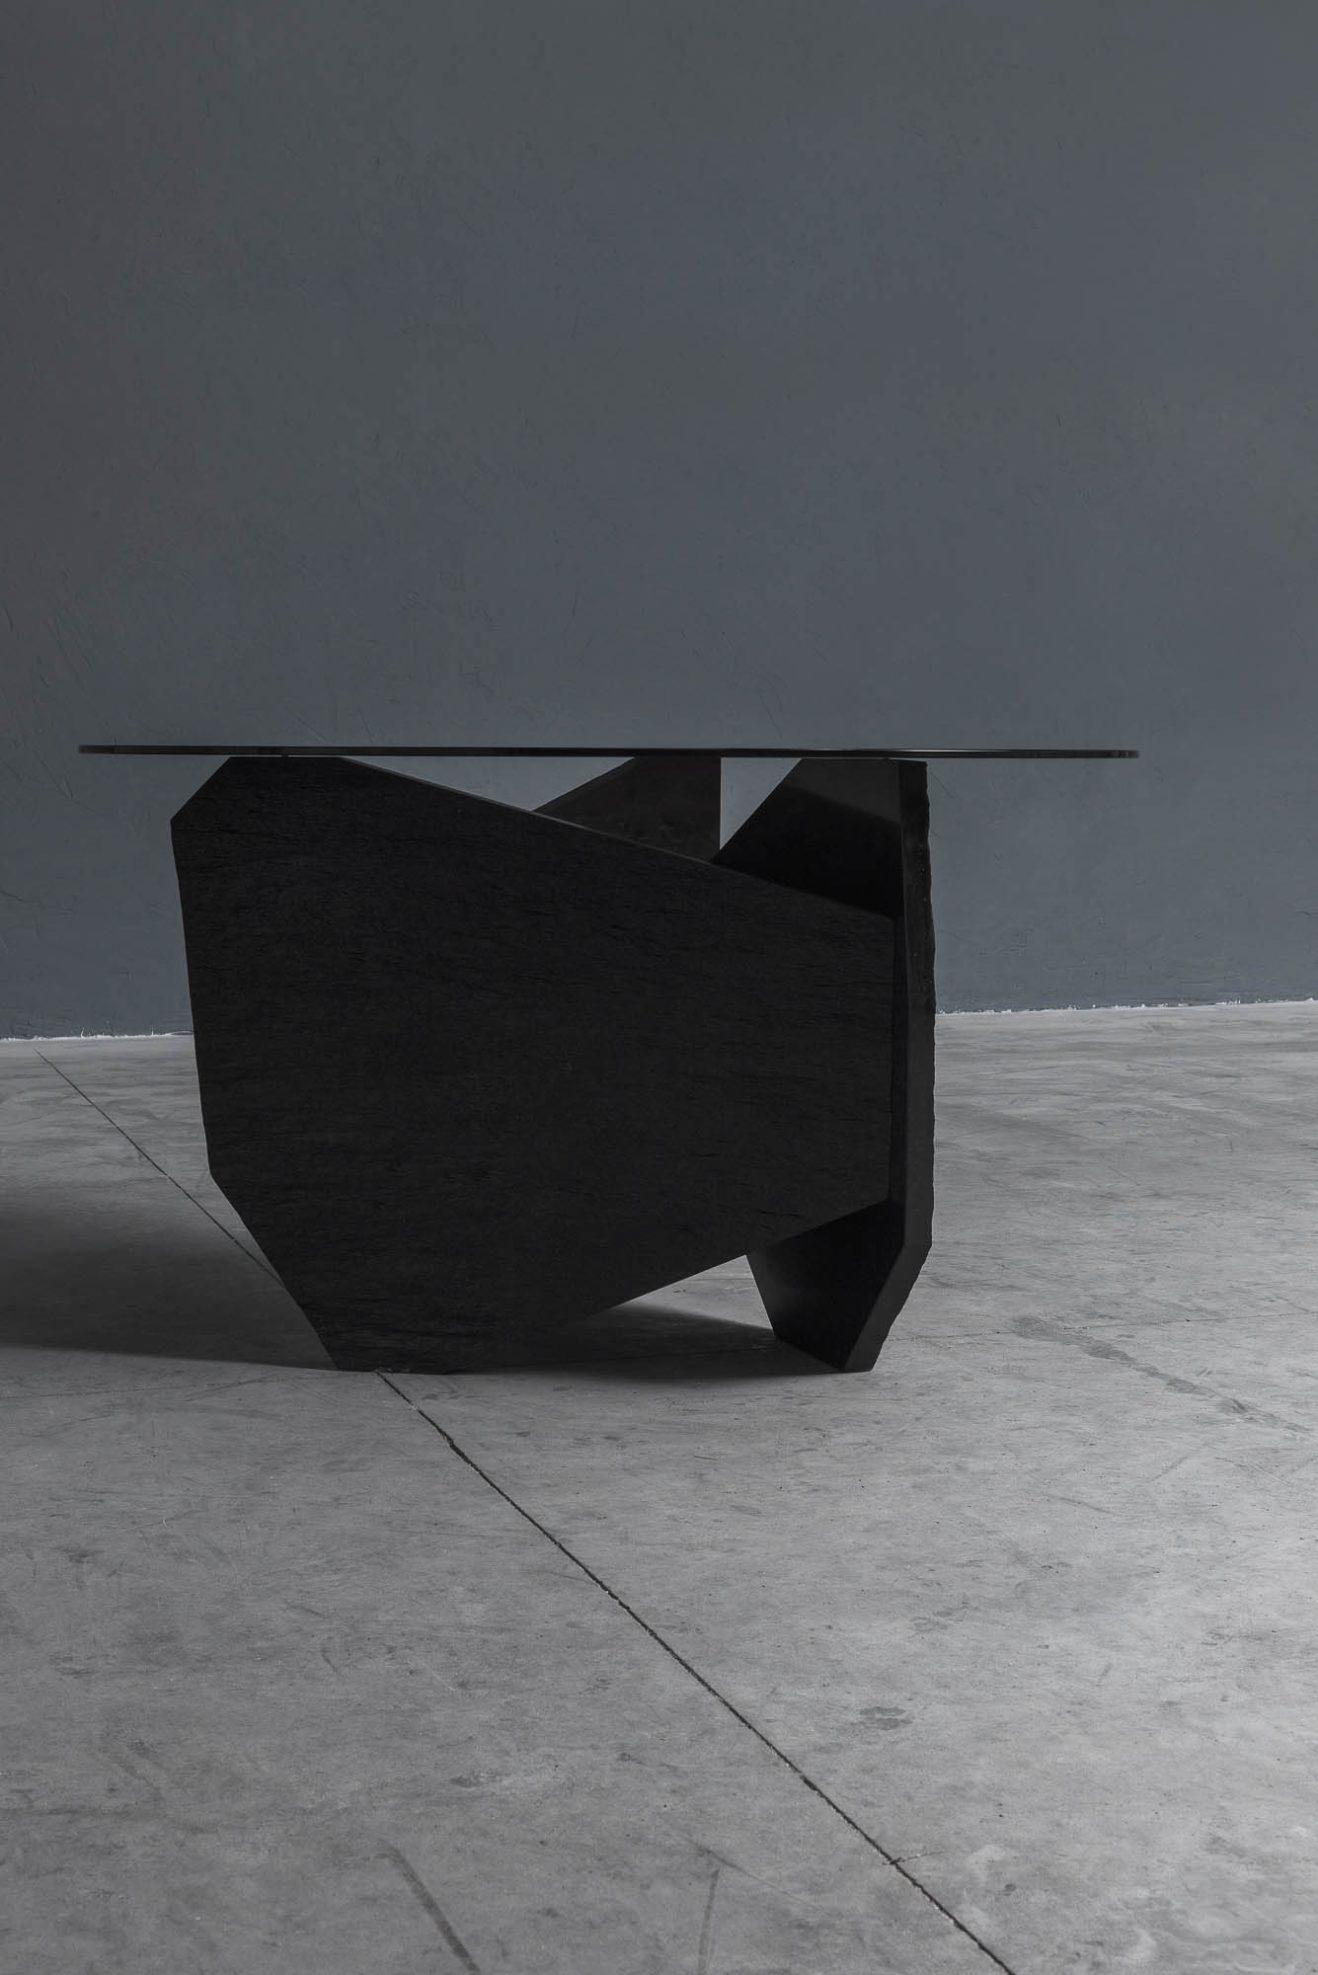 Frederic-Saulou-Fragmente-Dining Table-Savannah Bay Gallery-6